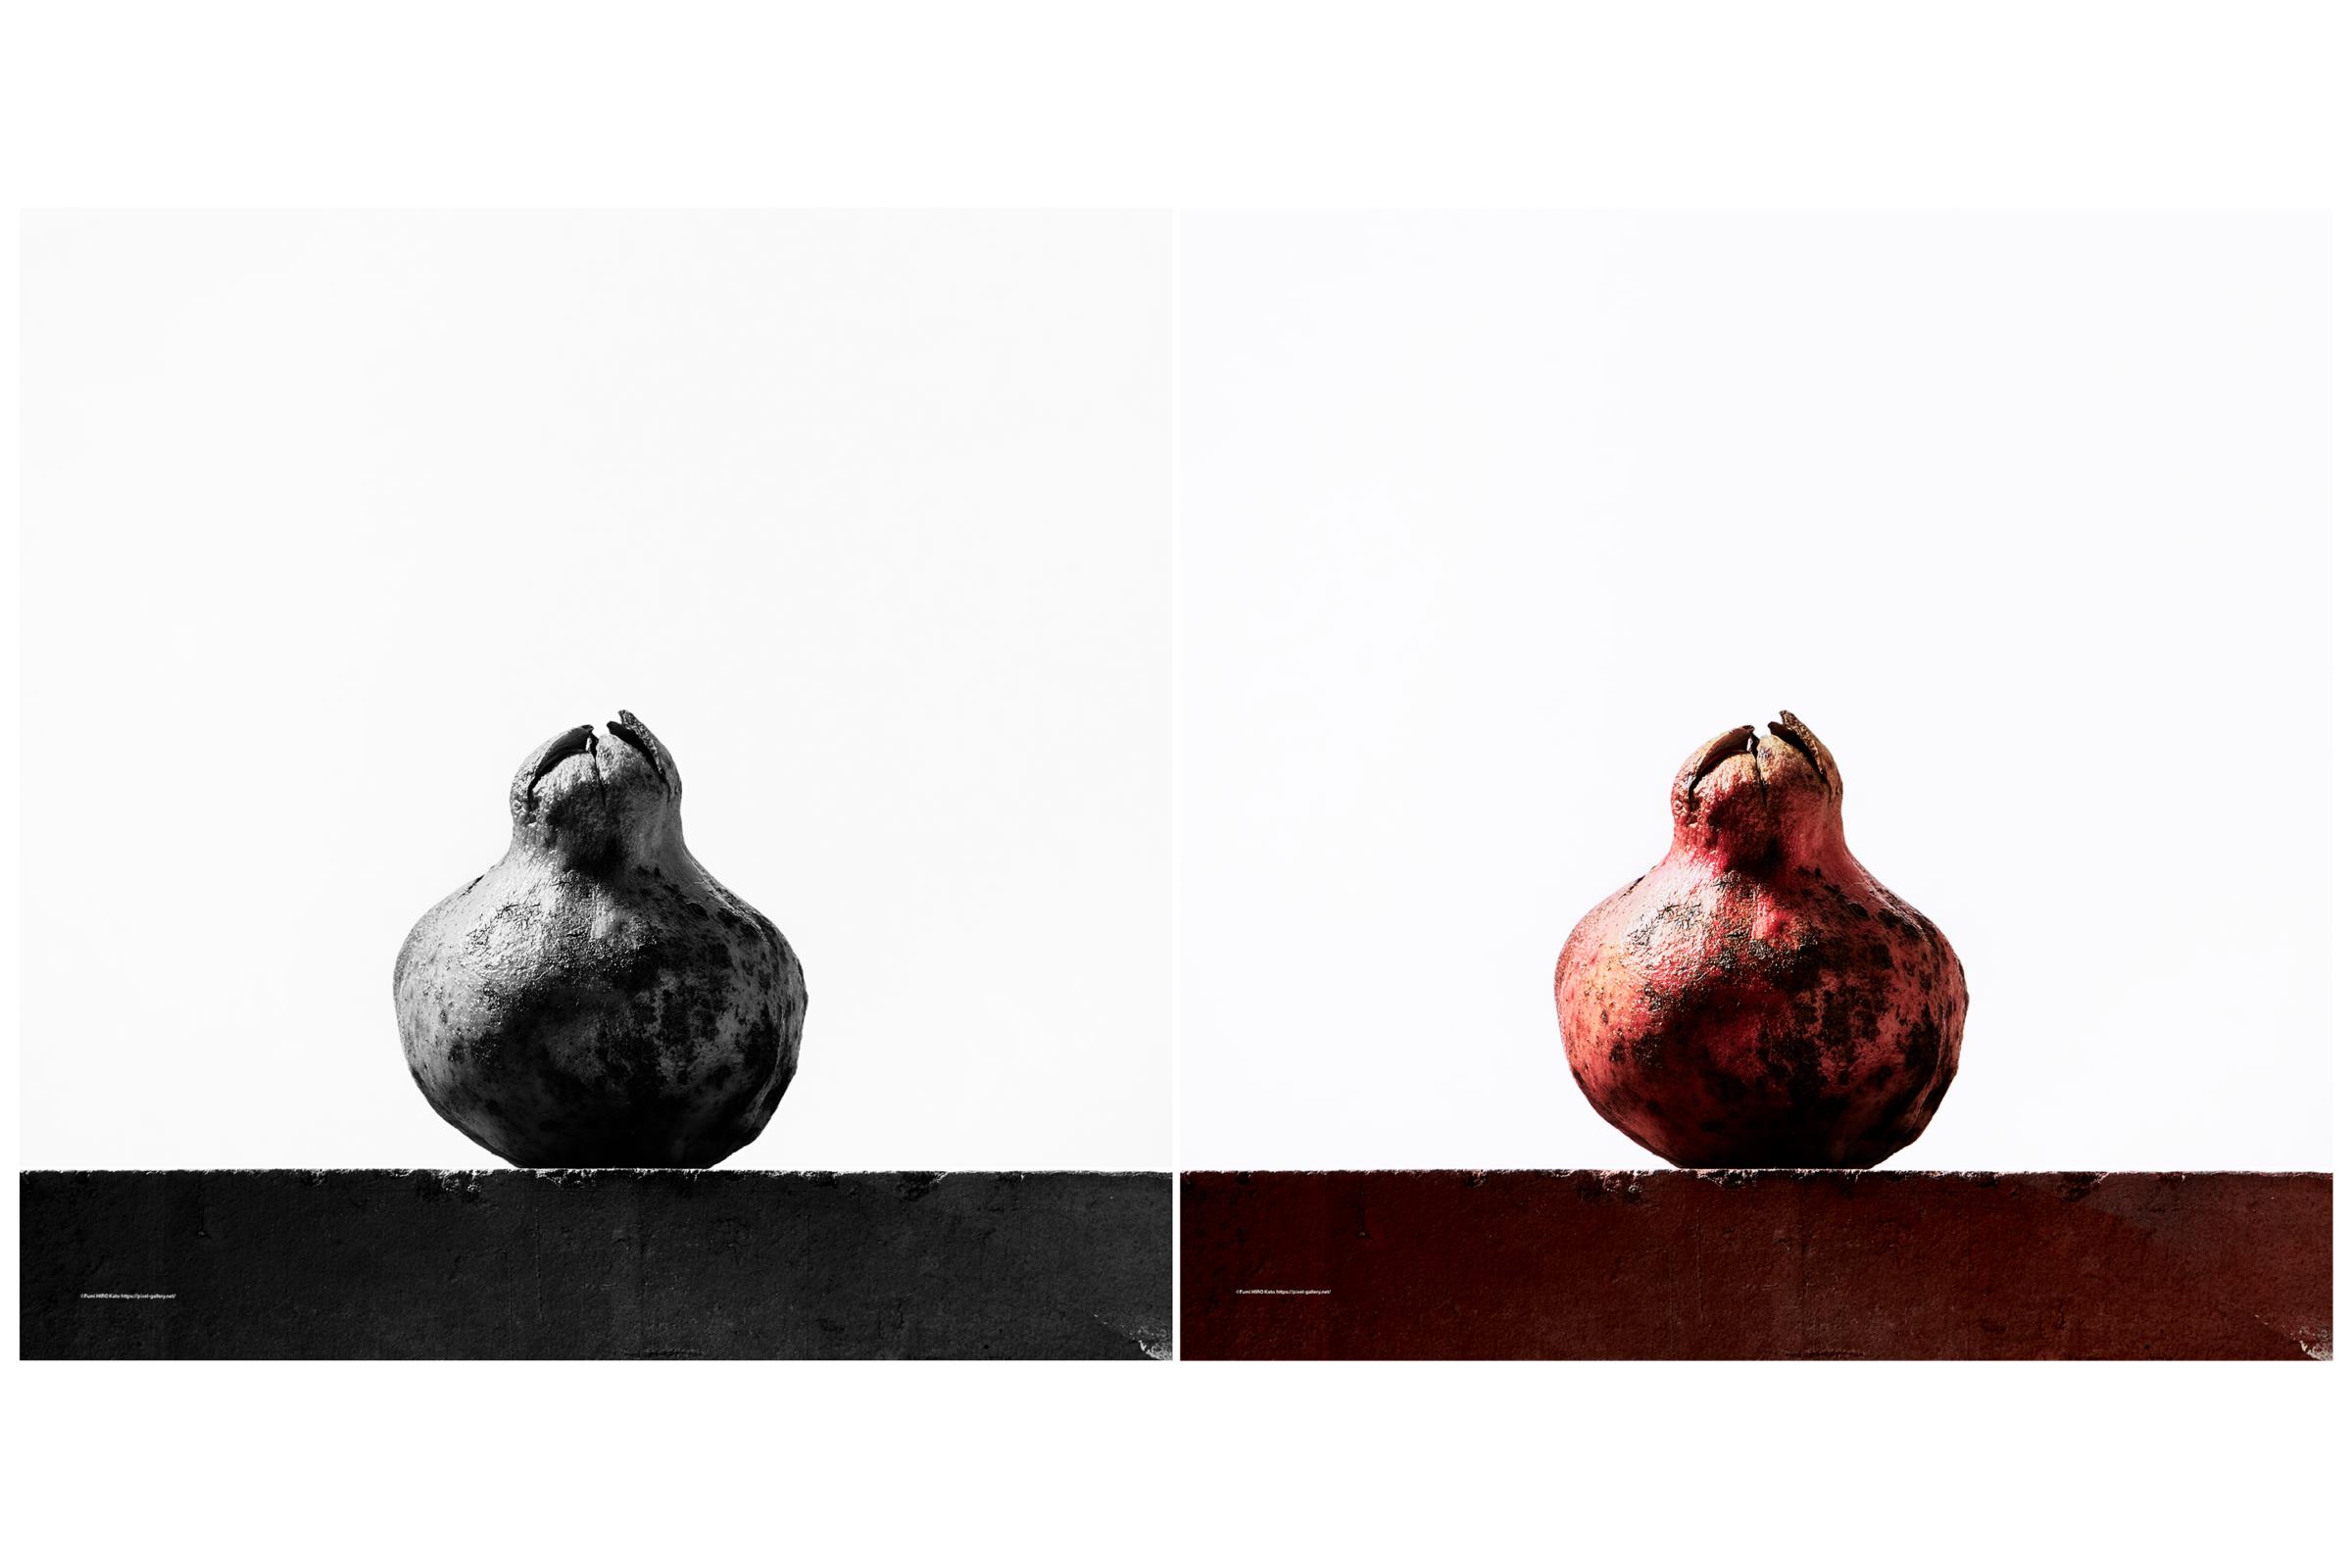 重力 柘榴 黒と赤 2021002